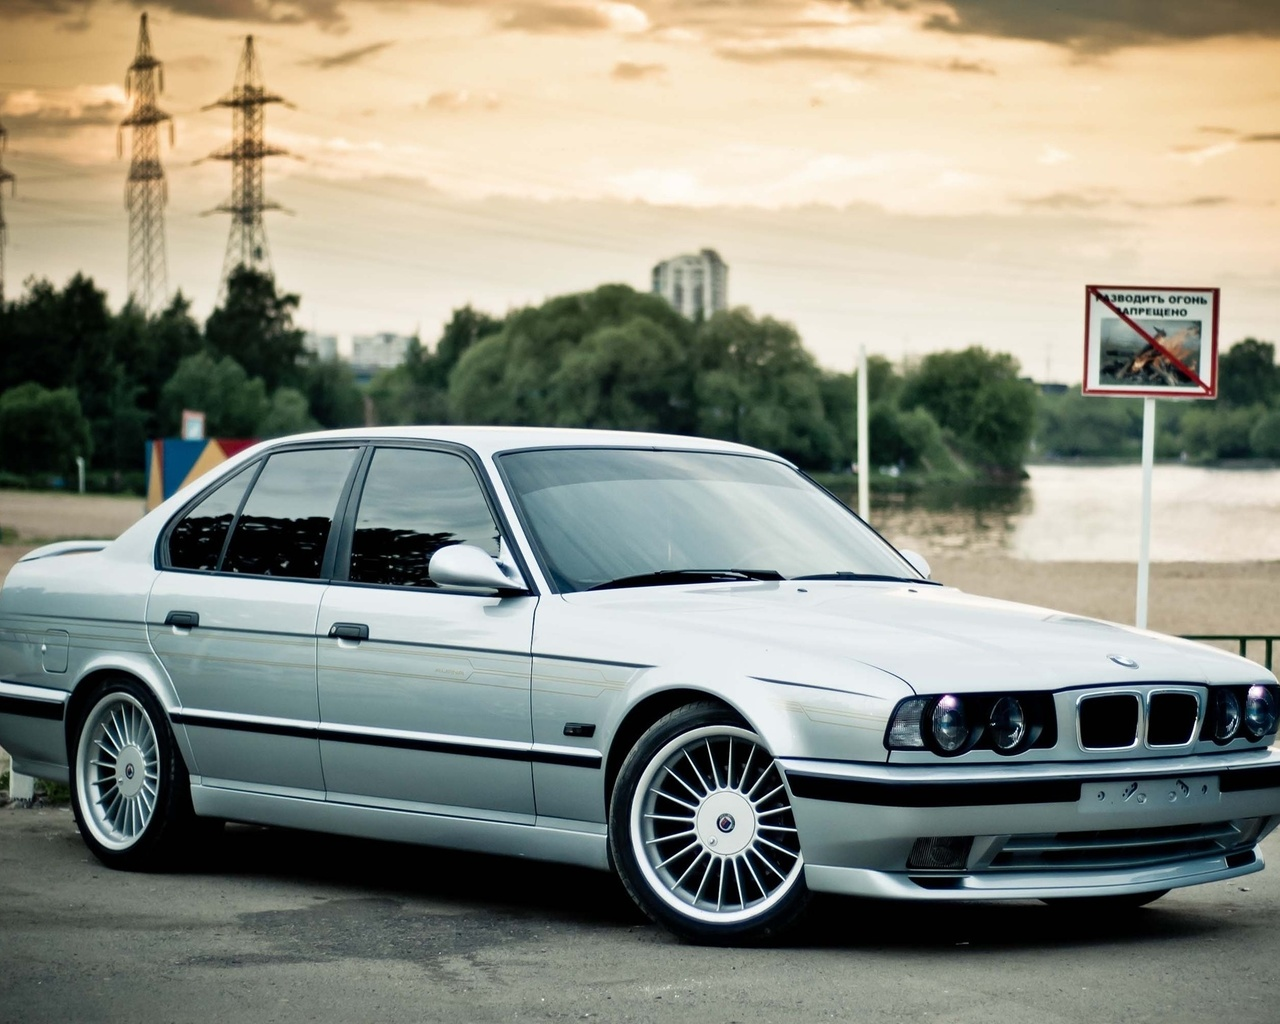 wallpapers bmw m5, cars, Bmw5, bmw m5 e34, auto